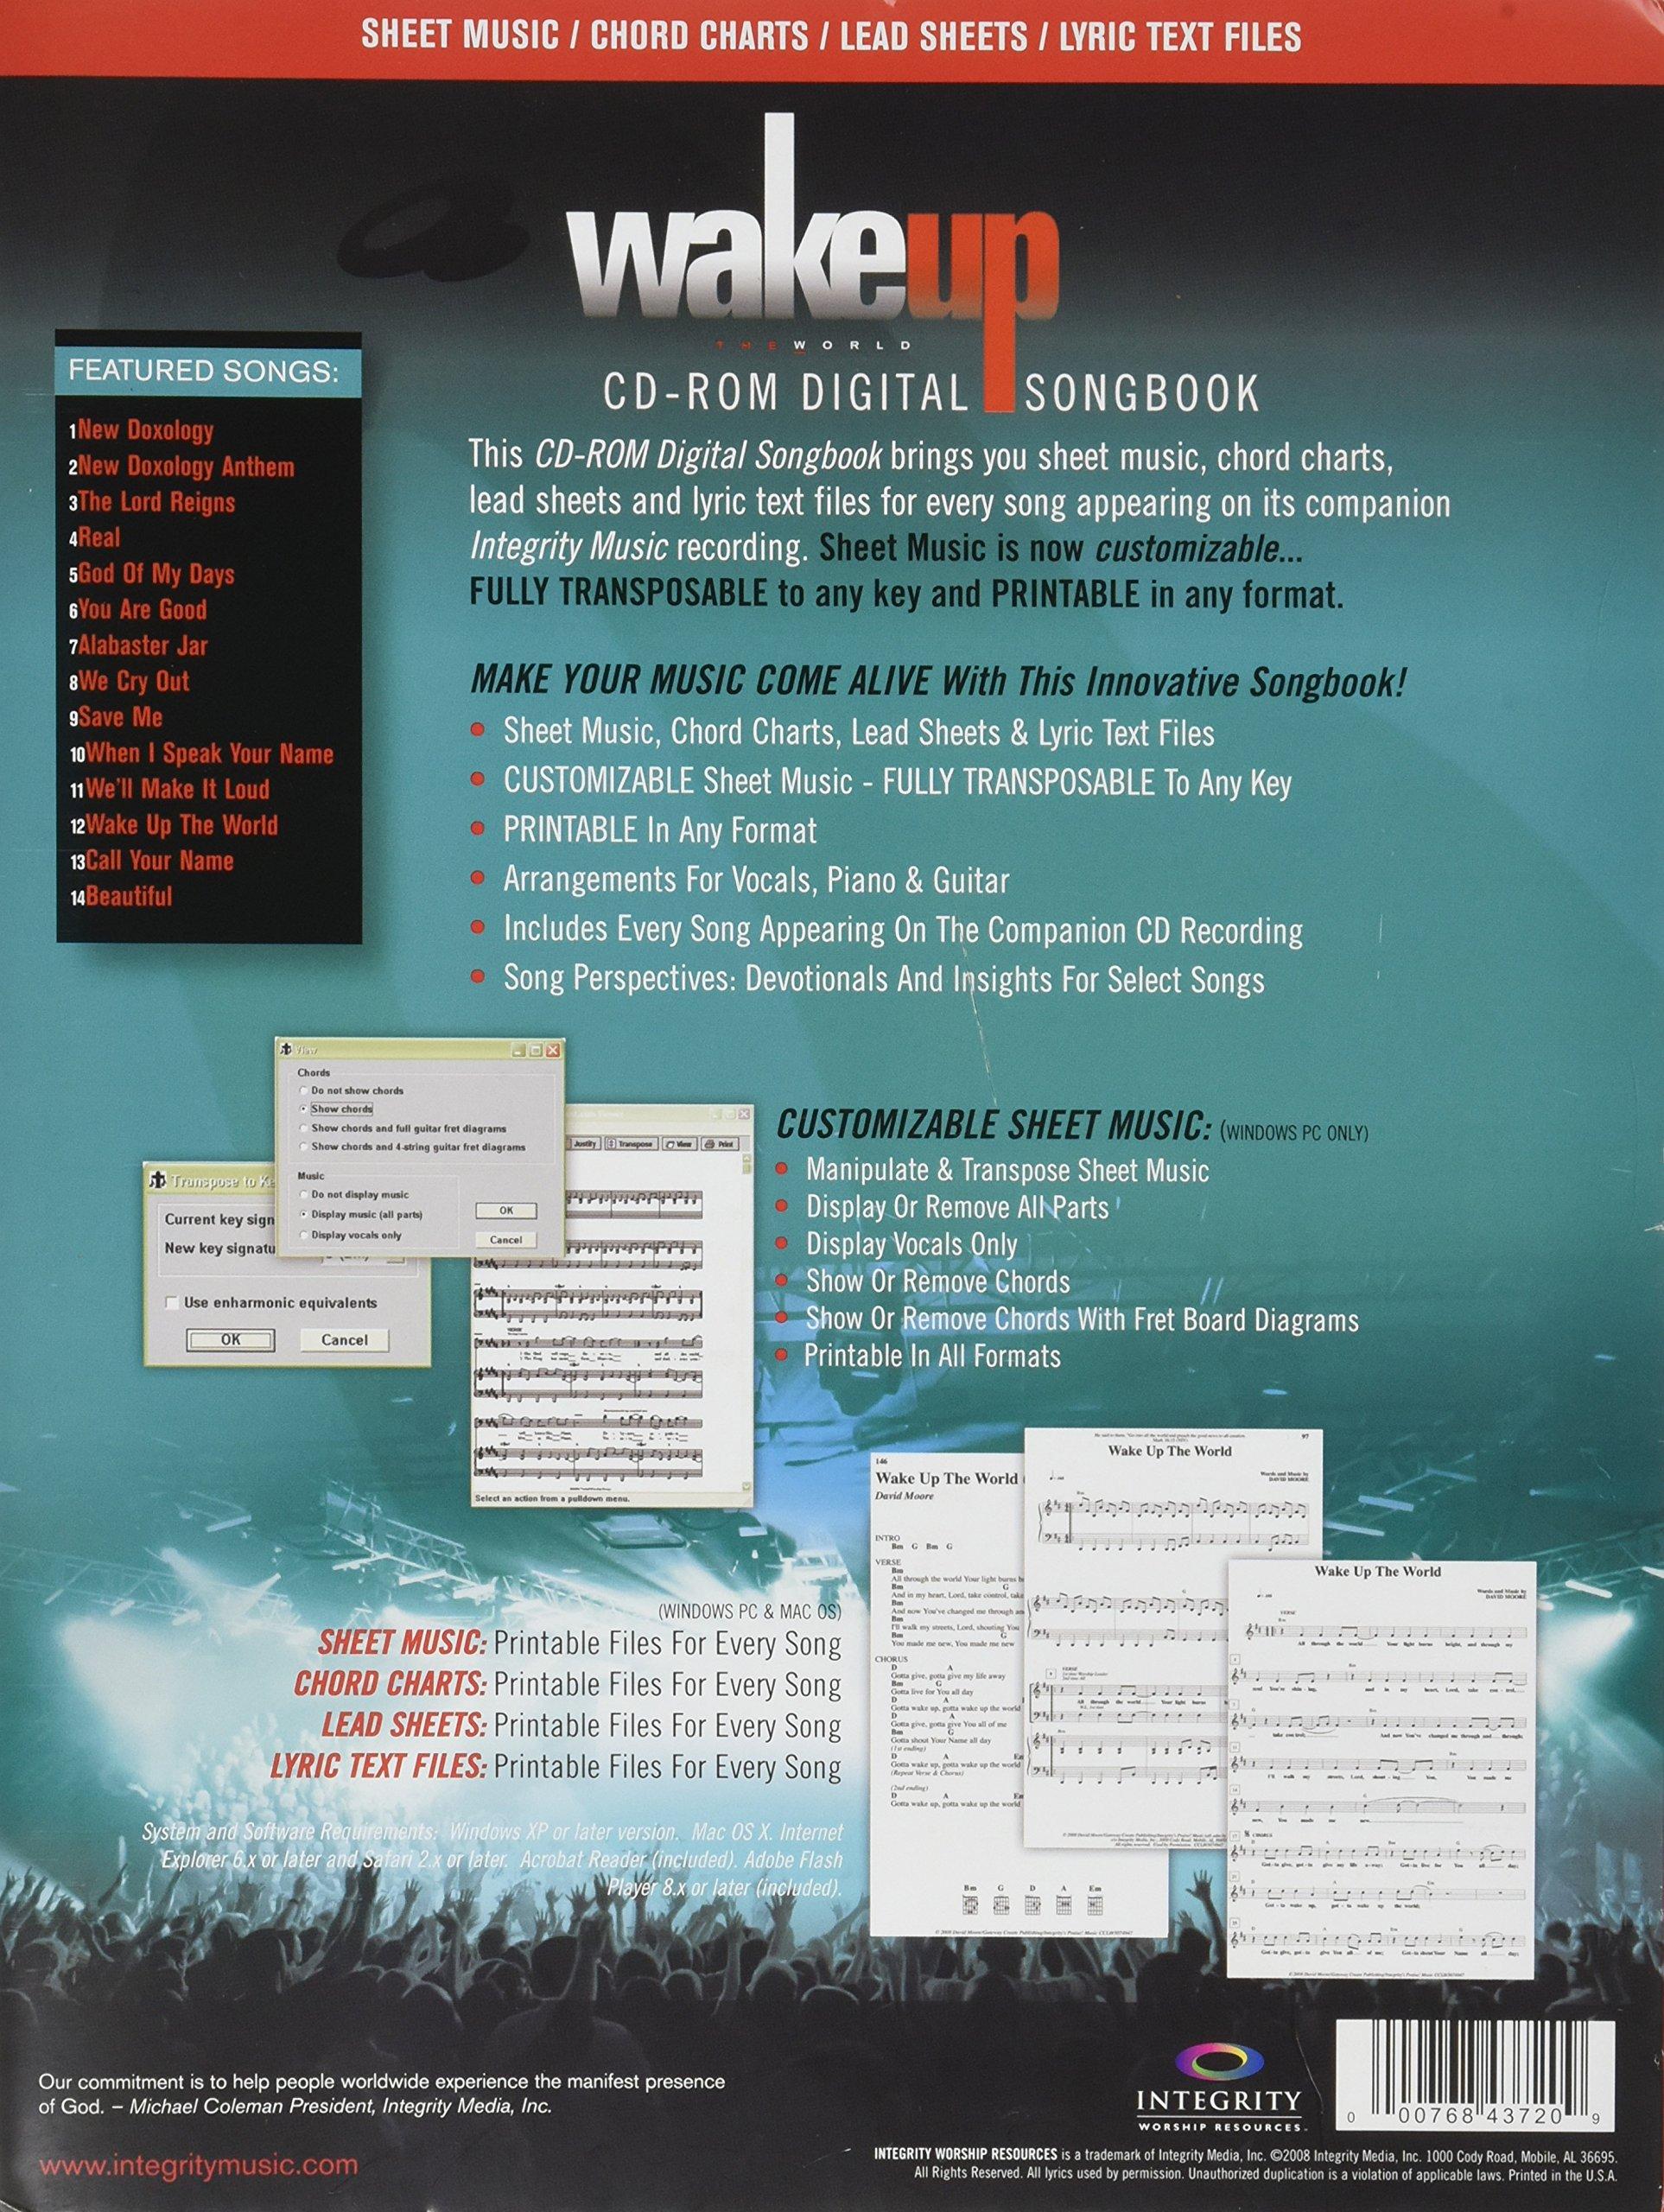 Gateway Worship Wakeup The World Cd Rom Digital Songbook Various